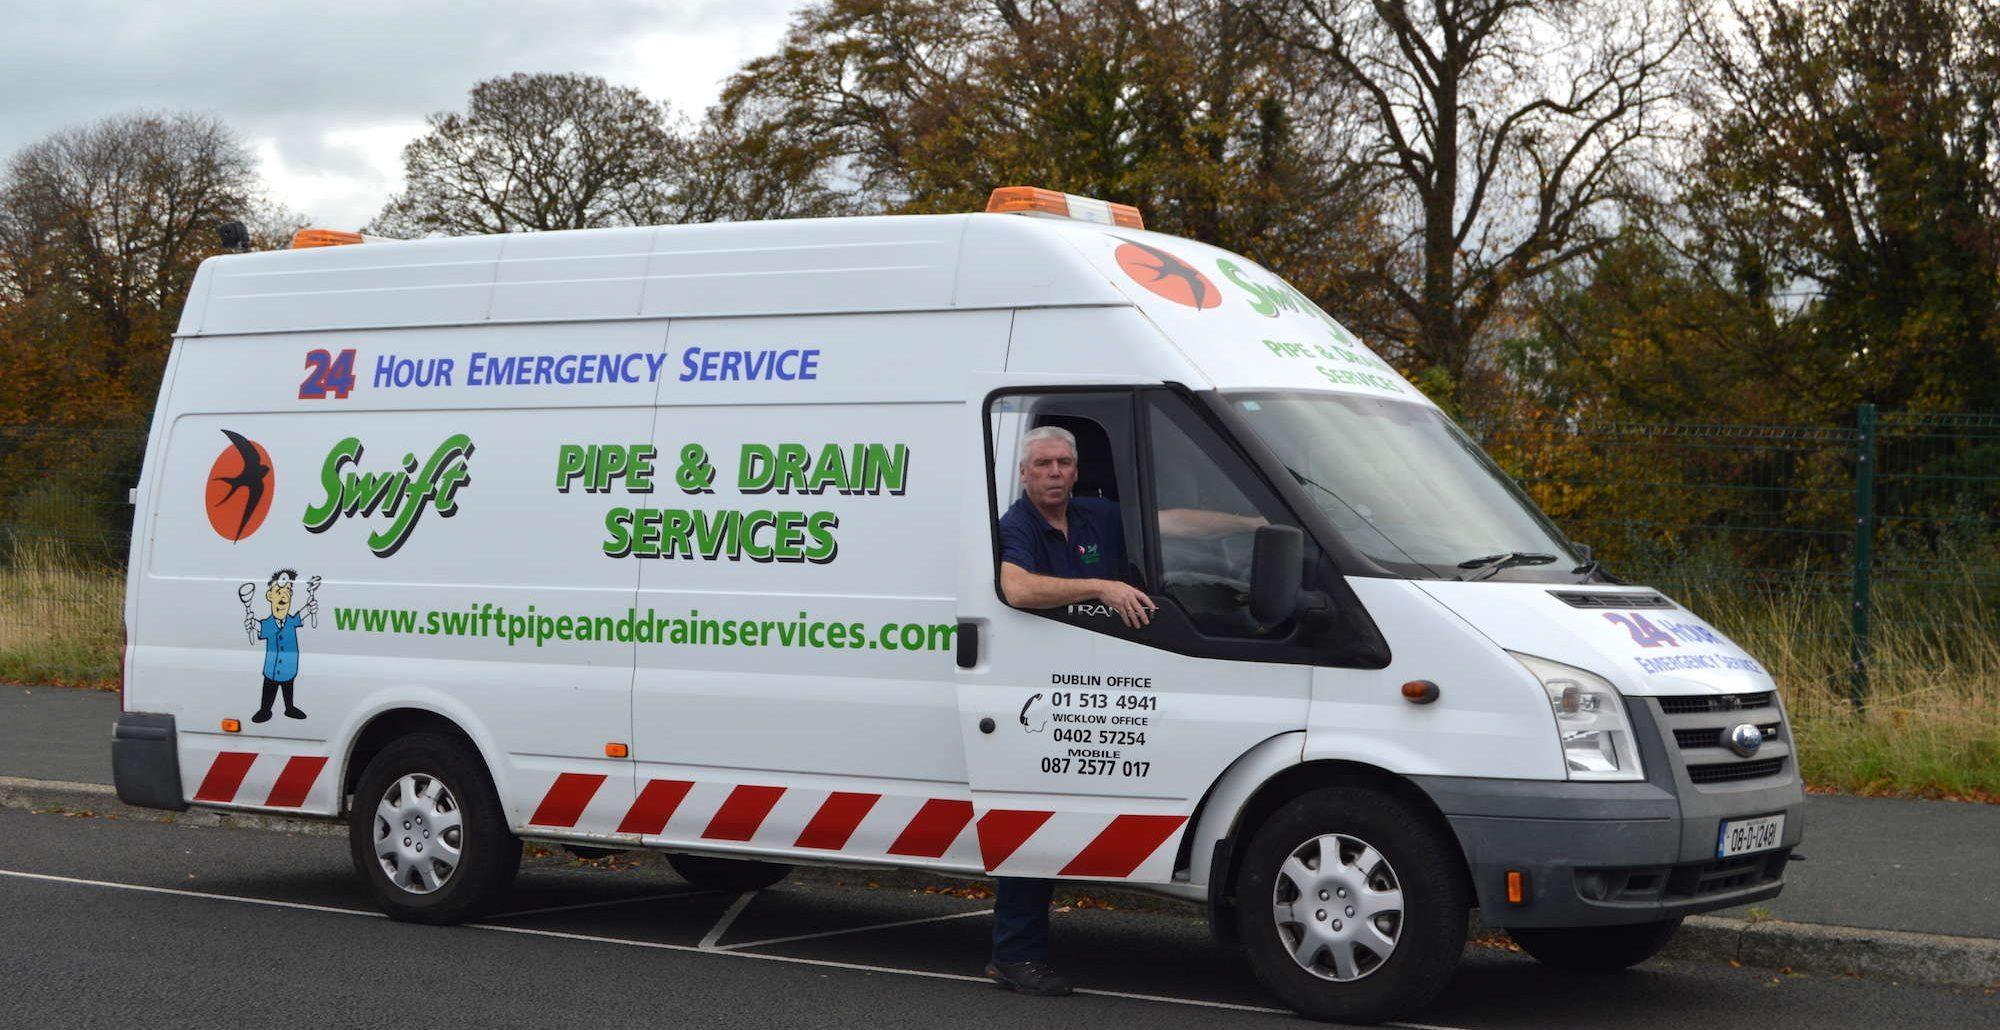 PIPE   &   DRAIN SERVICES